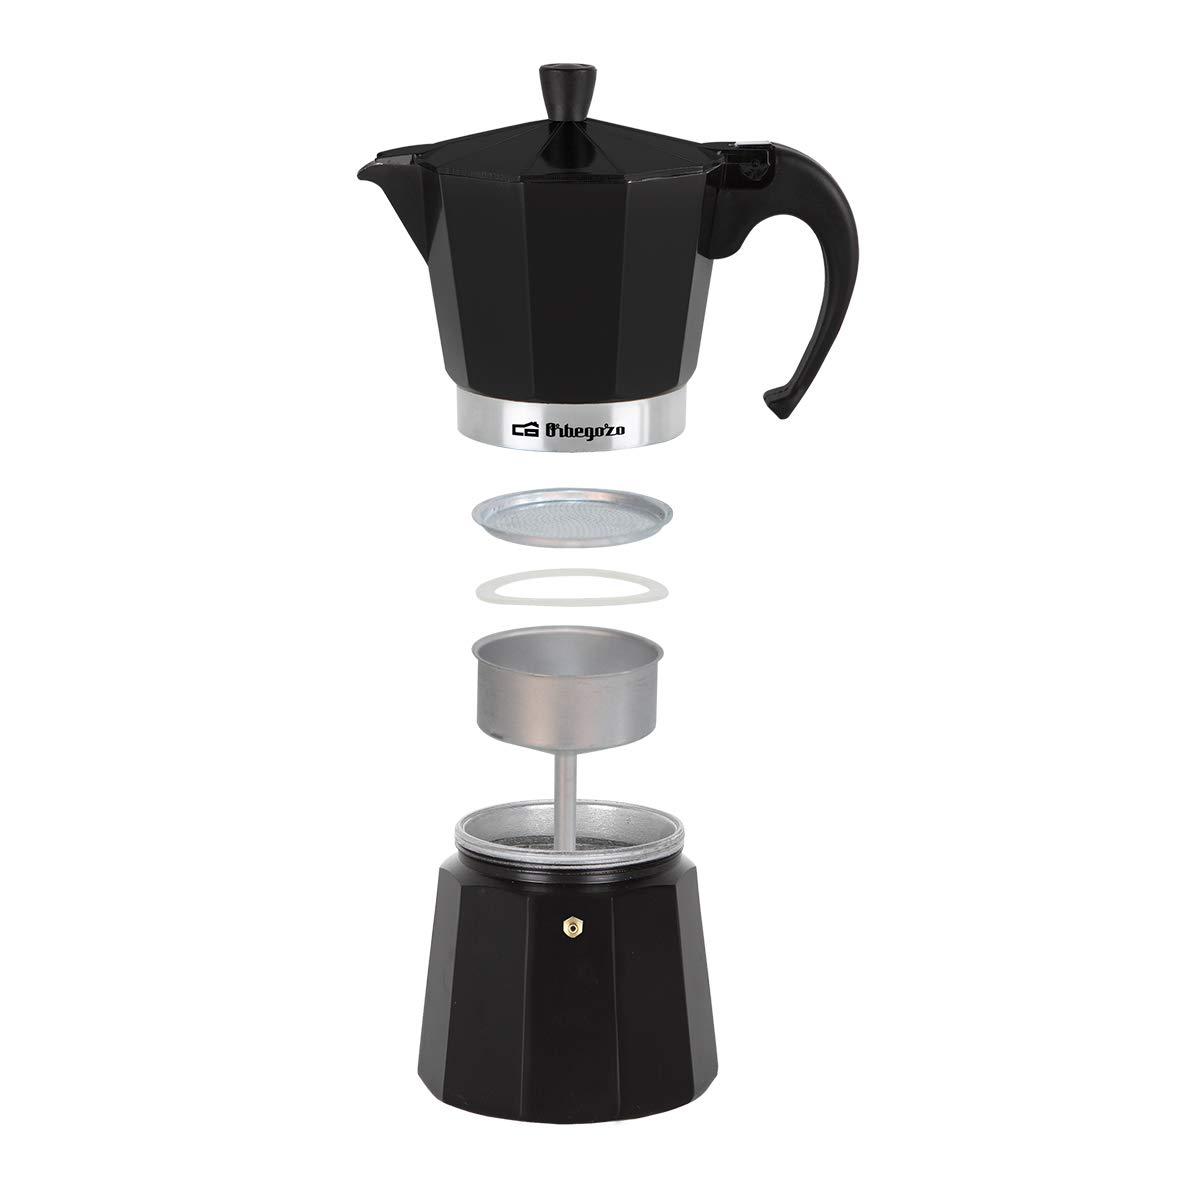 Orbegozo KFN310 KFN 310-Cafetera, 3 Tazas, Color, Aluminio, Negro ...